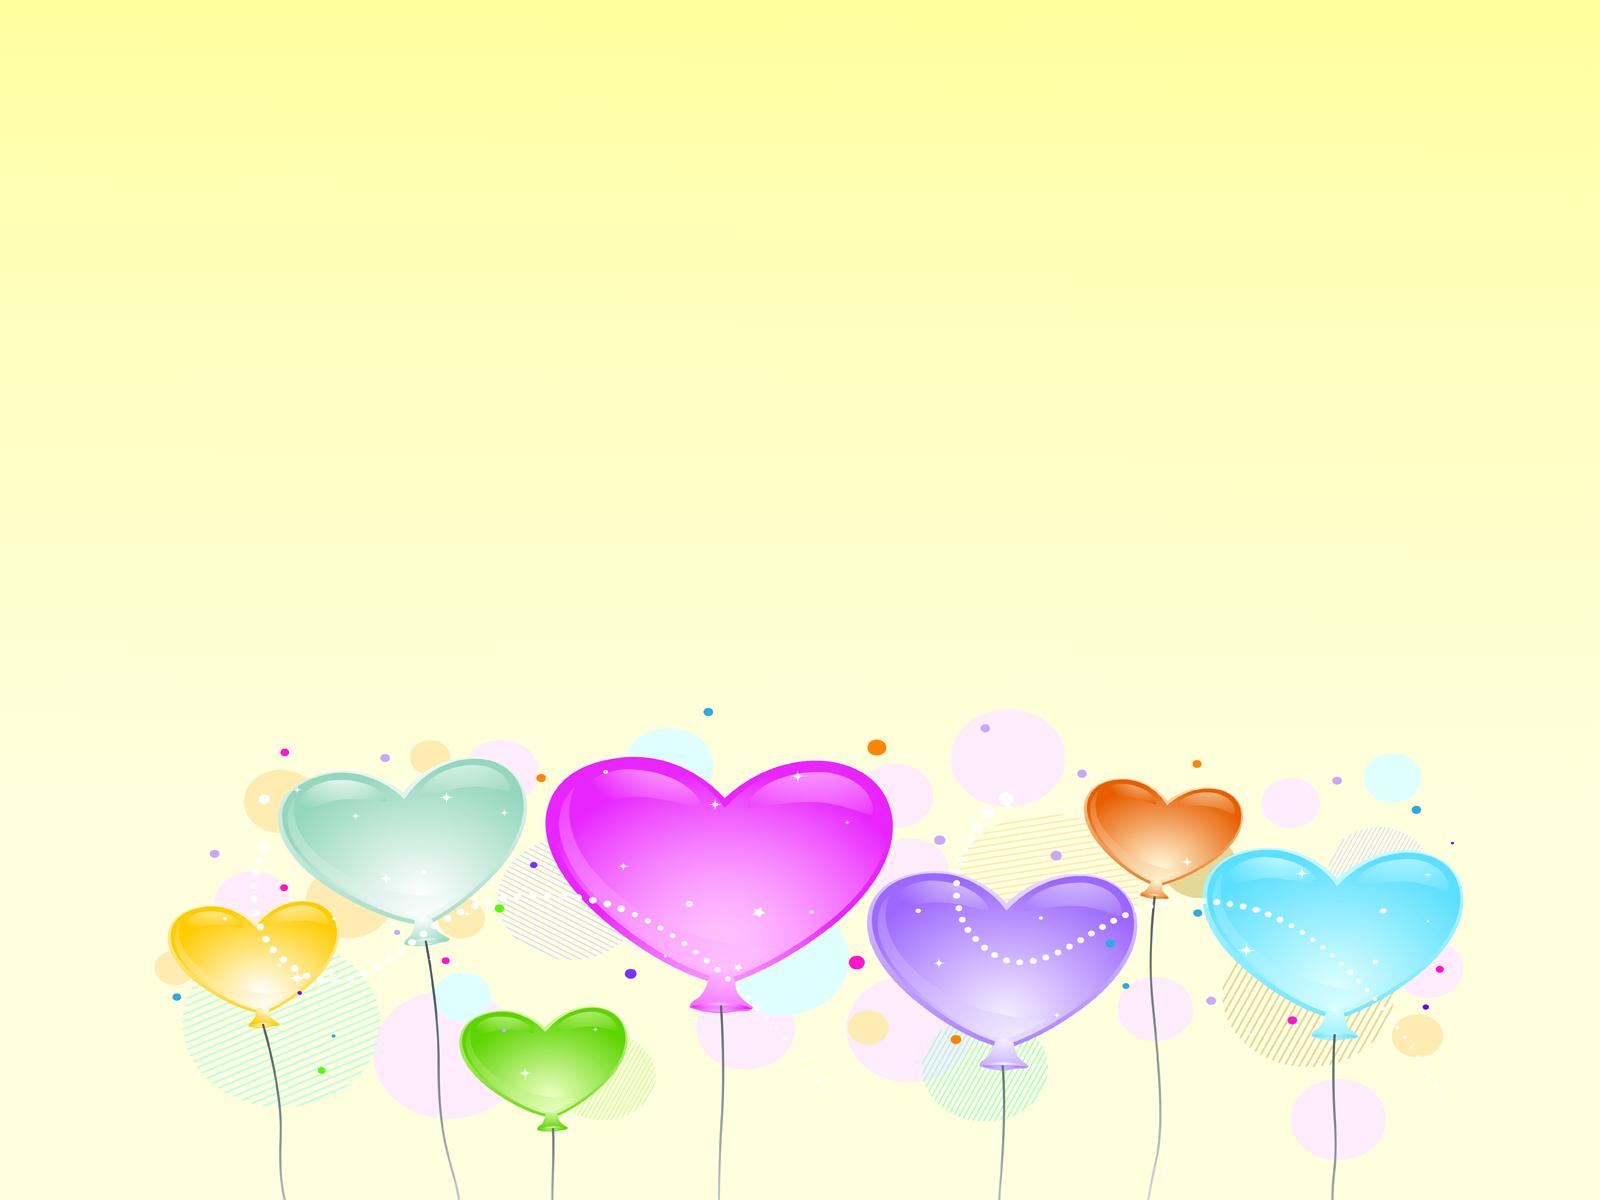 Clip art love balloons ppt backgrounds blue green love pink download background toneelgroepblik Images